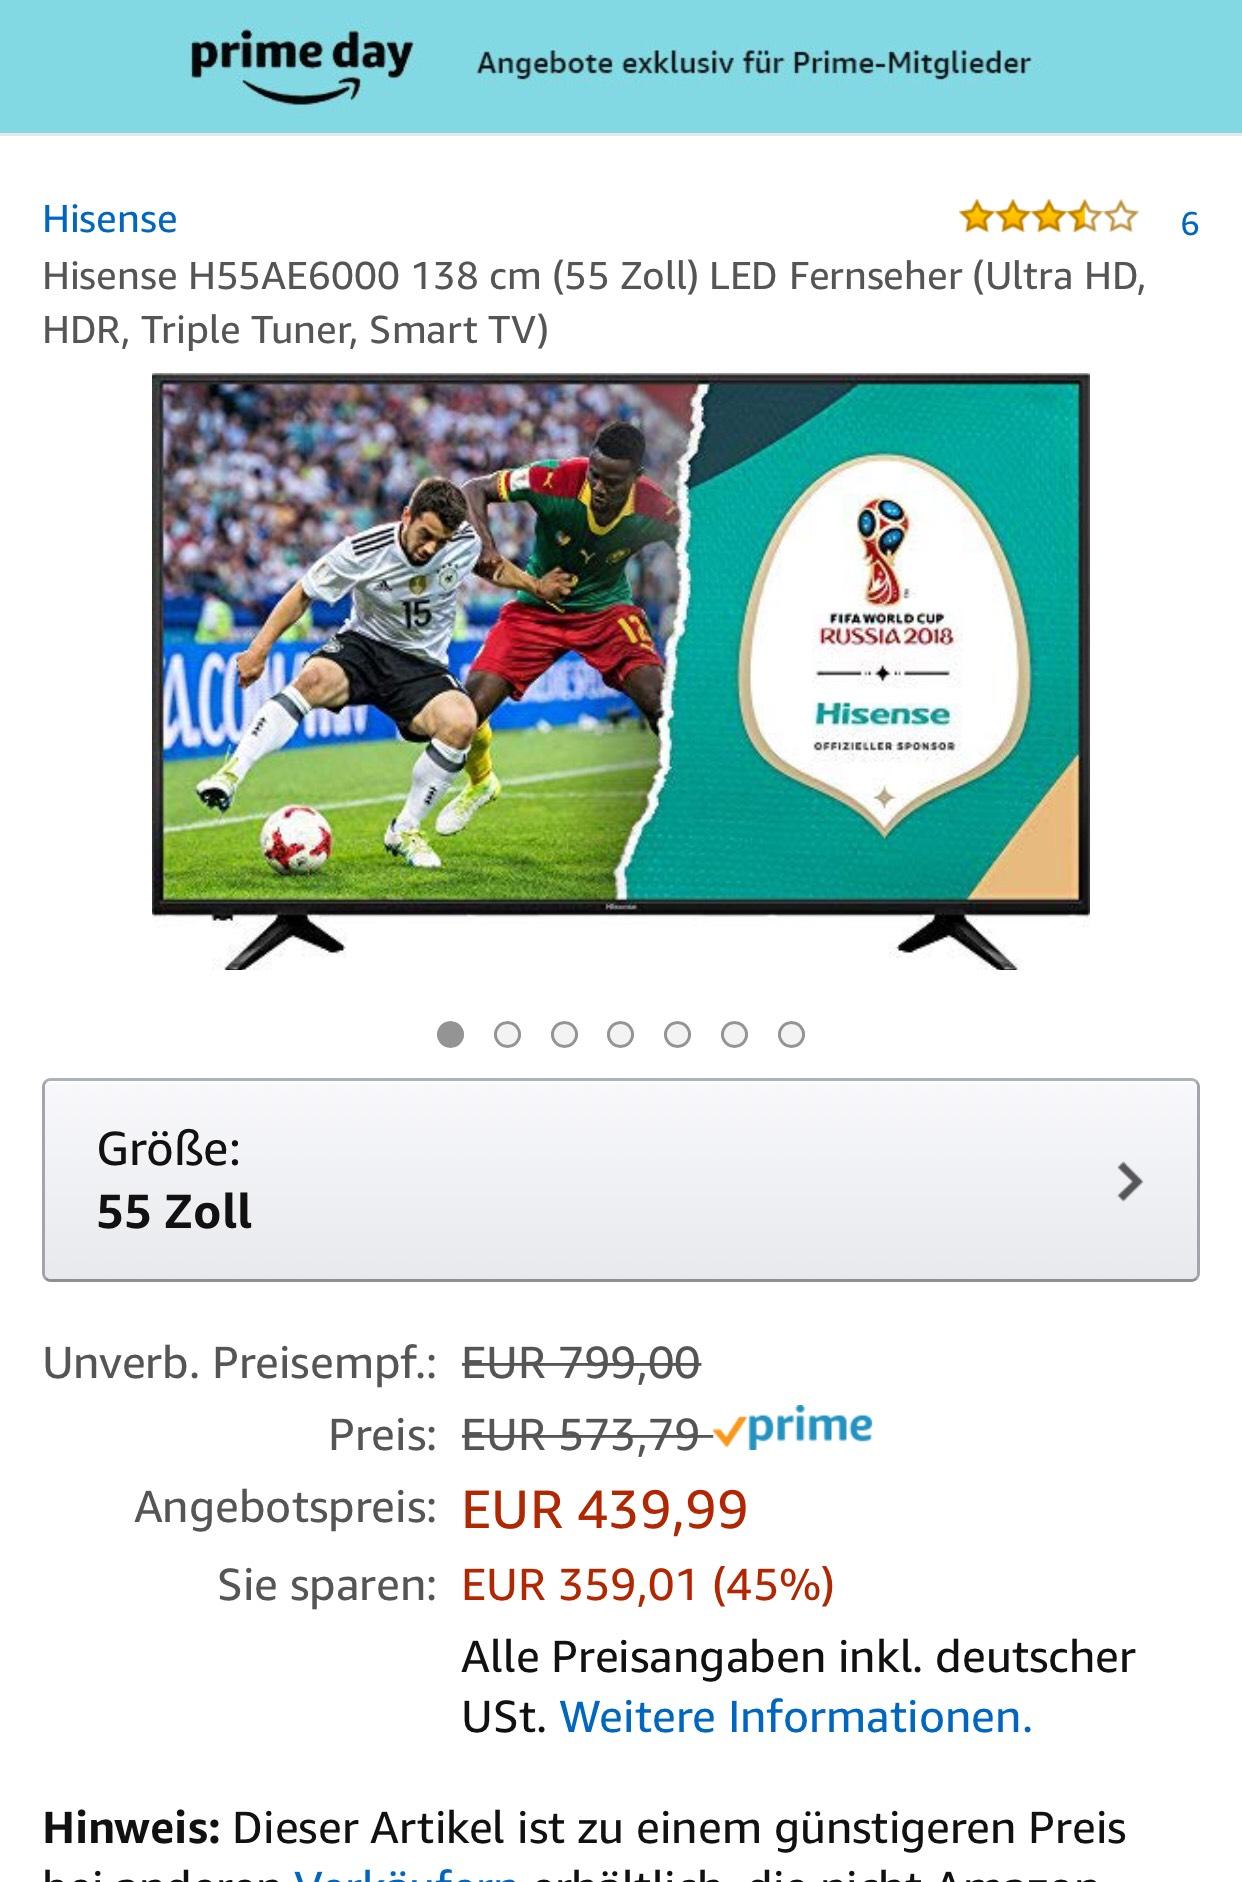 Amazon Prime Day Hisense H55AE6000 138 cm (55 Zoll) LED Fernseher (Ultra HD, HDR, Triple Tuner, Smart TV)